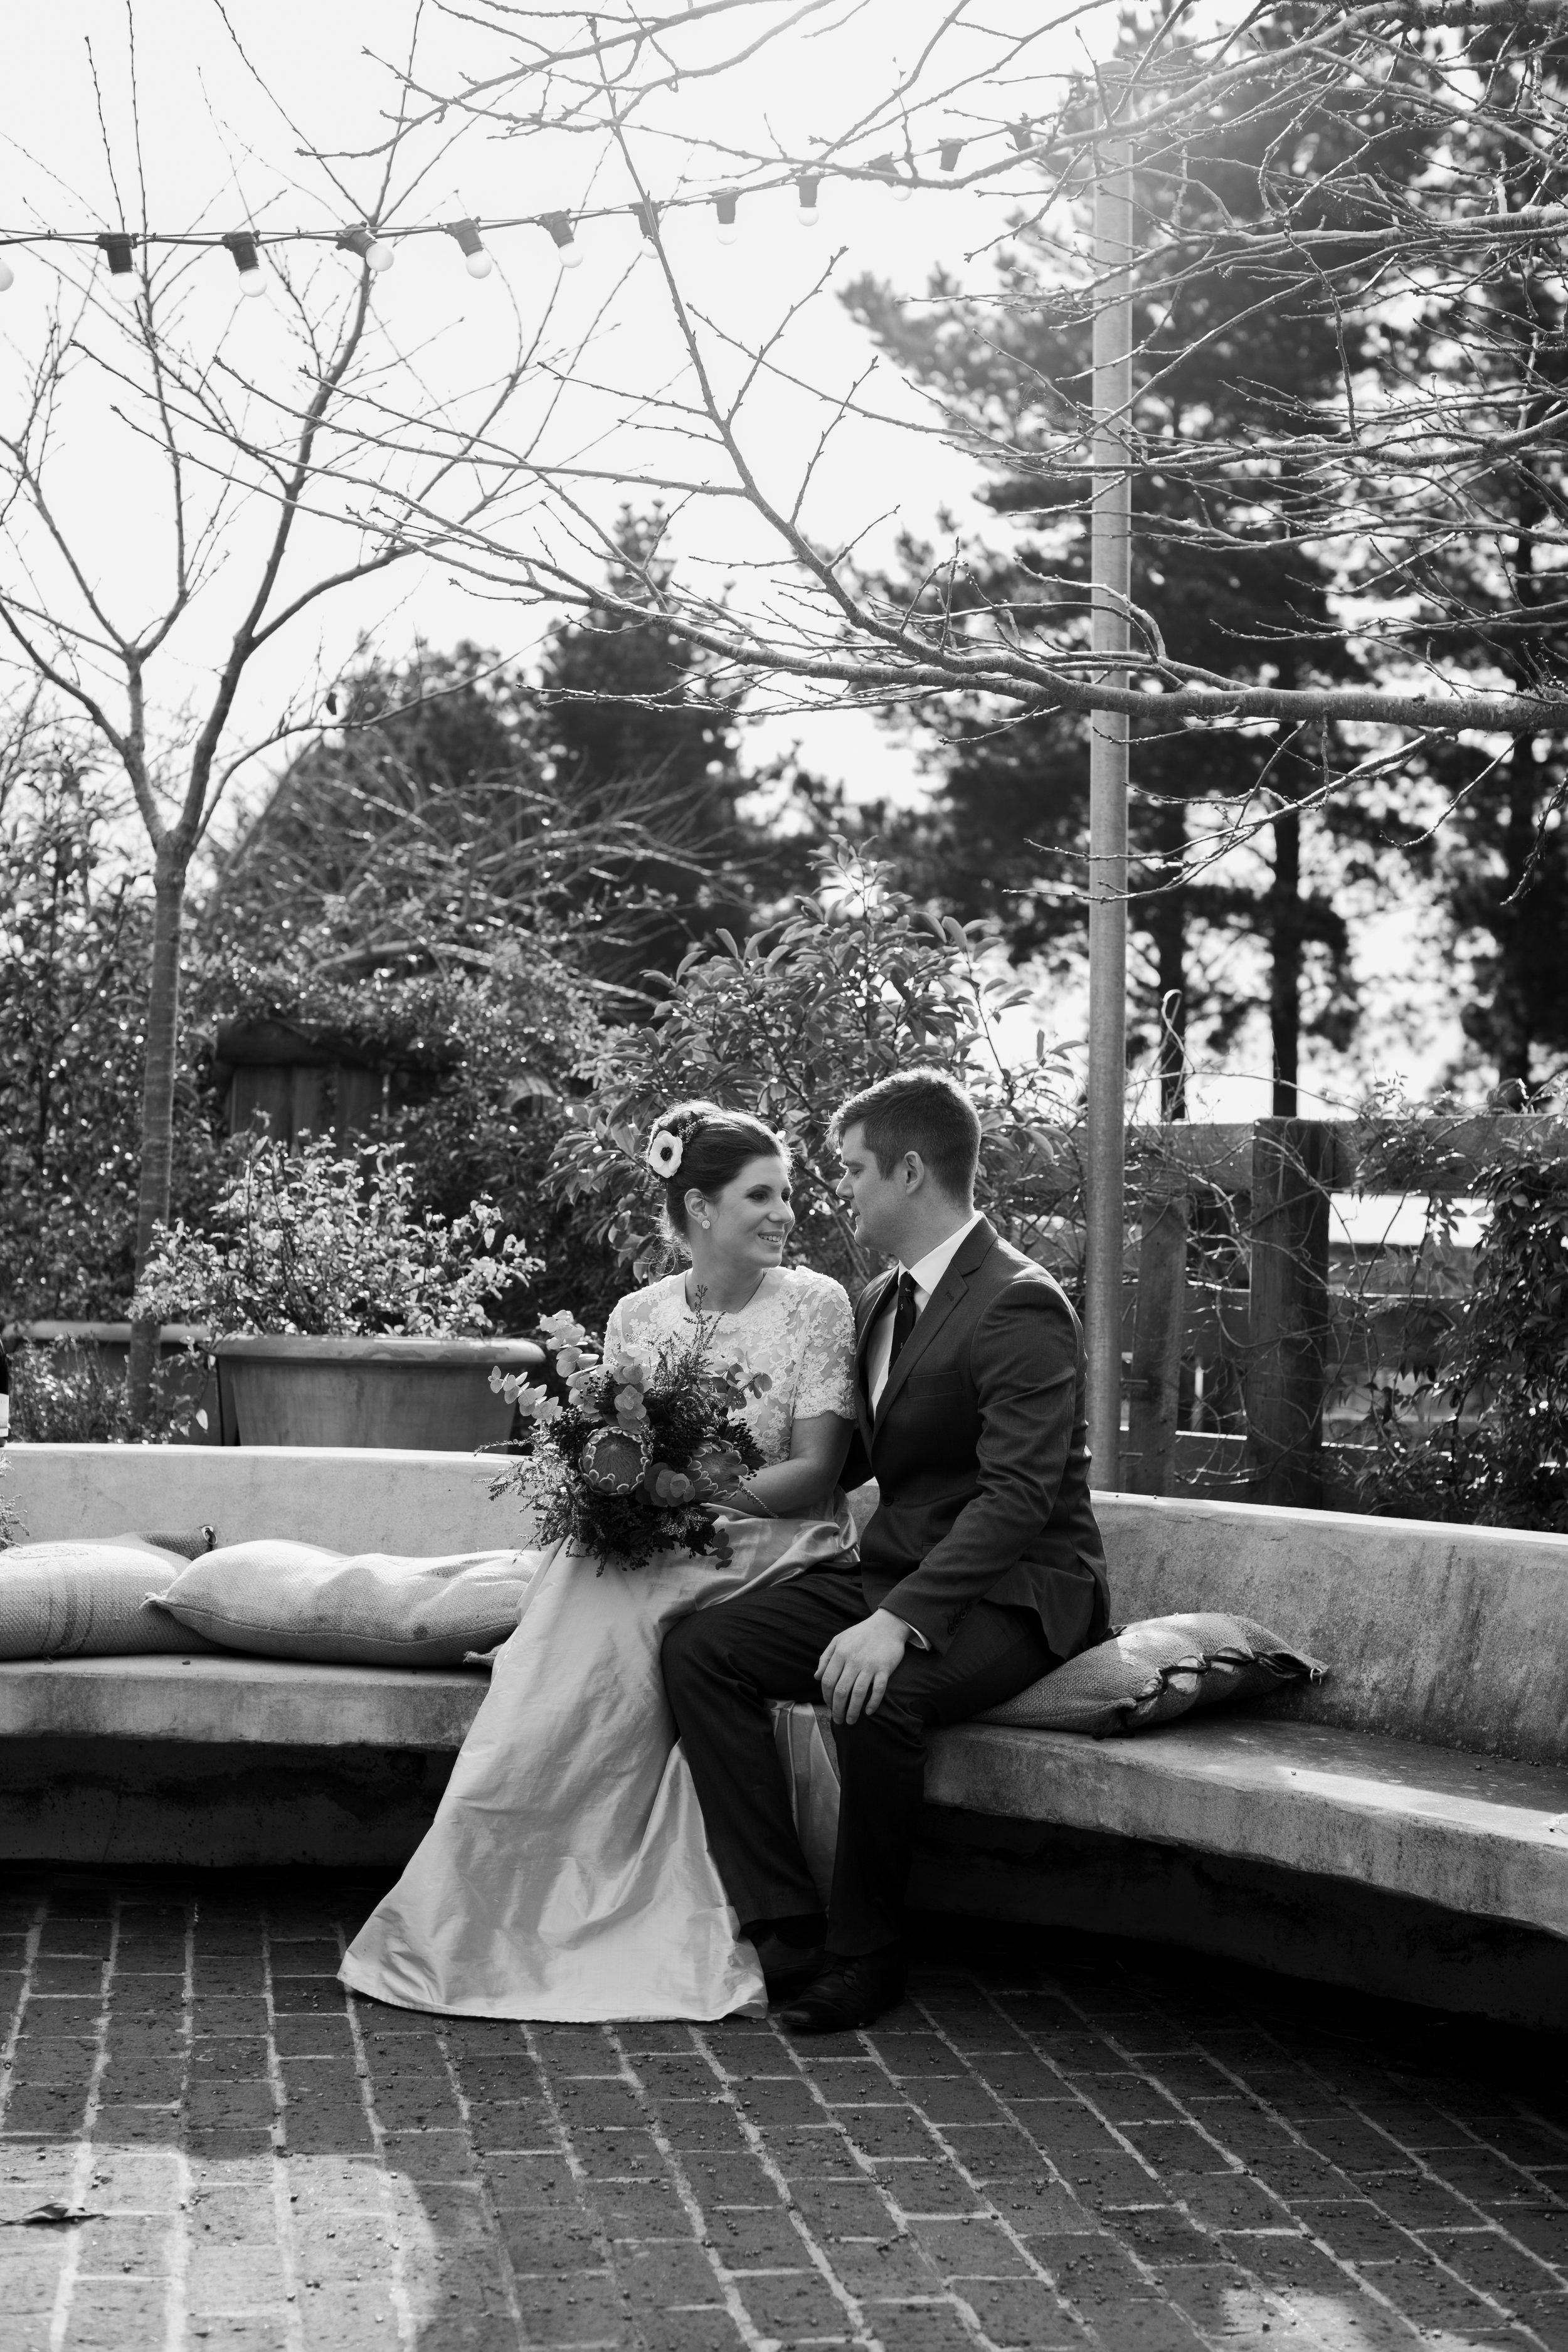 Wedding Photography Black and White.jpg